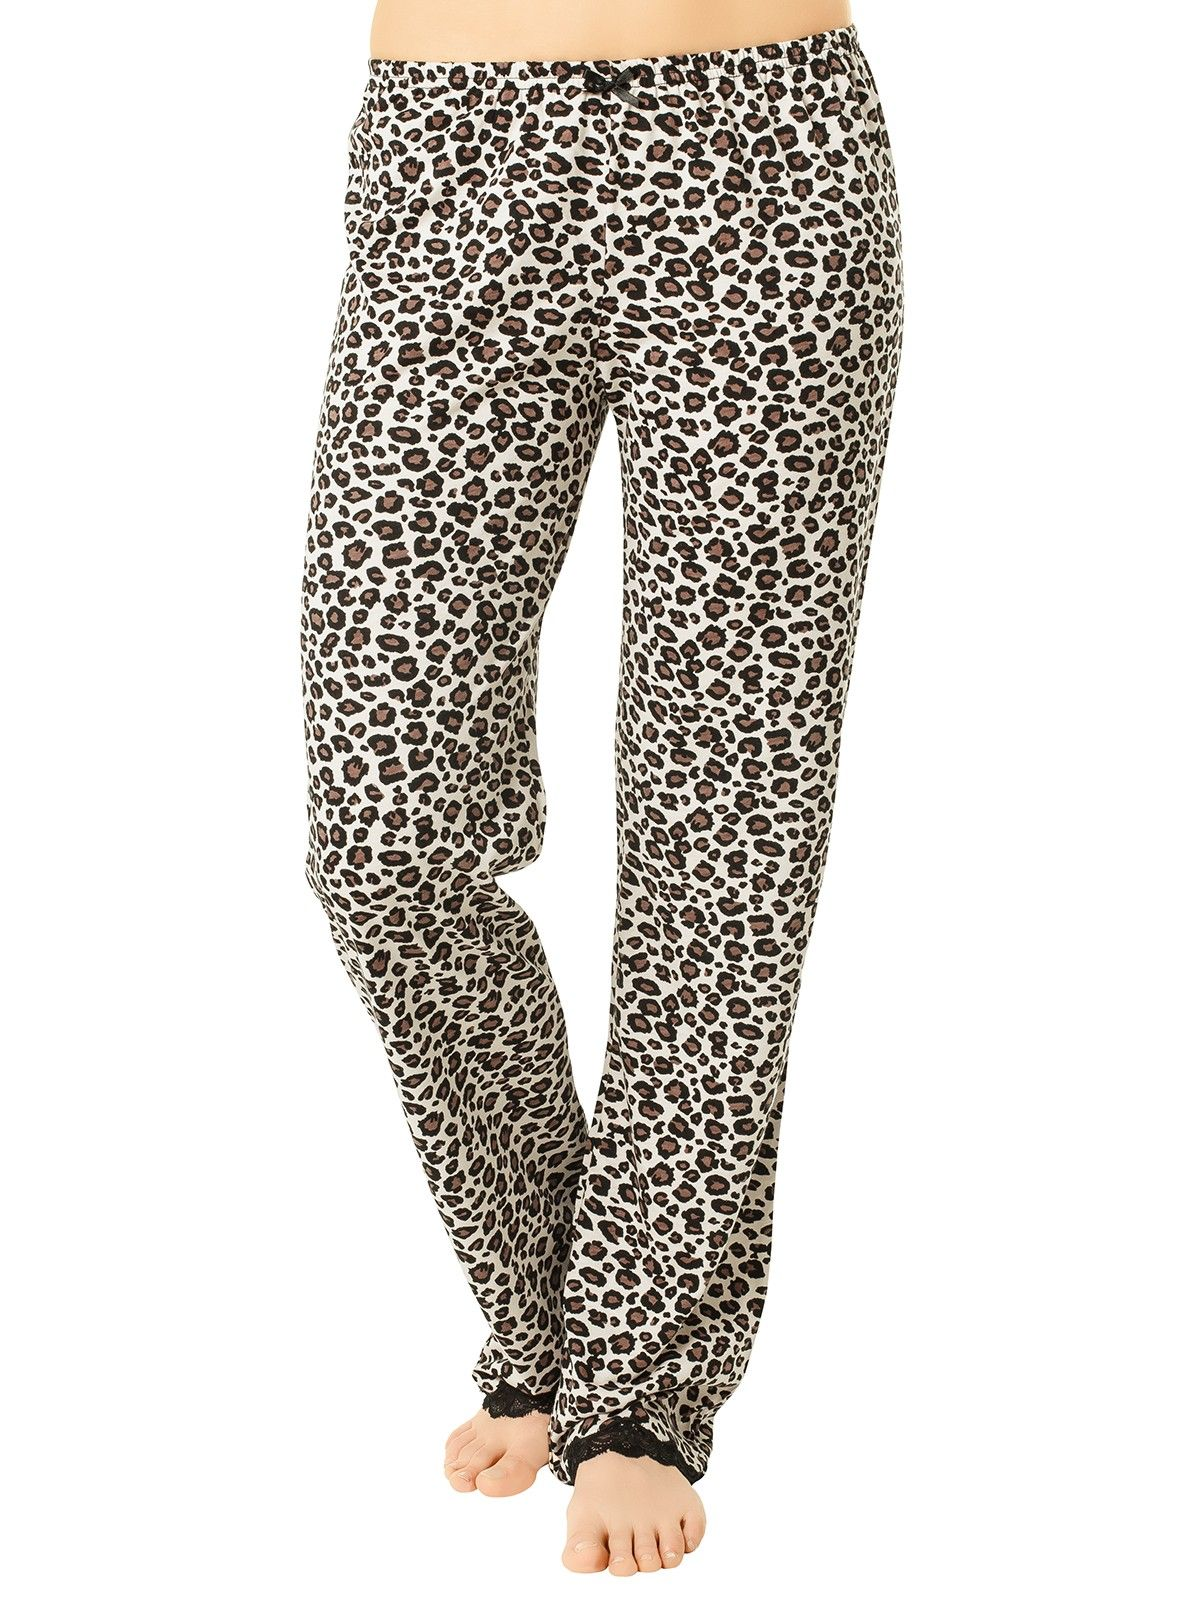 My Leo Romance Pyjama Pants long leo/allover - NAPO Shop - der offizielle Nastrovje Potsdam Shop